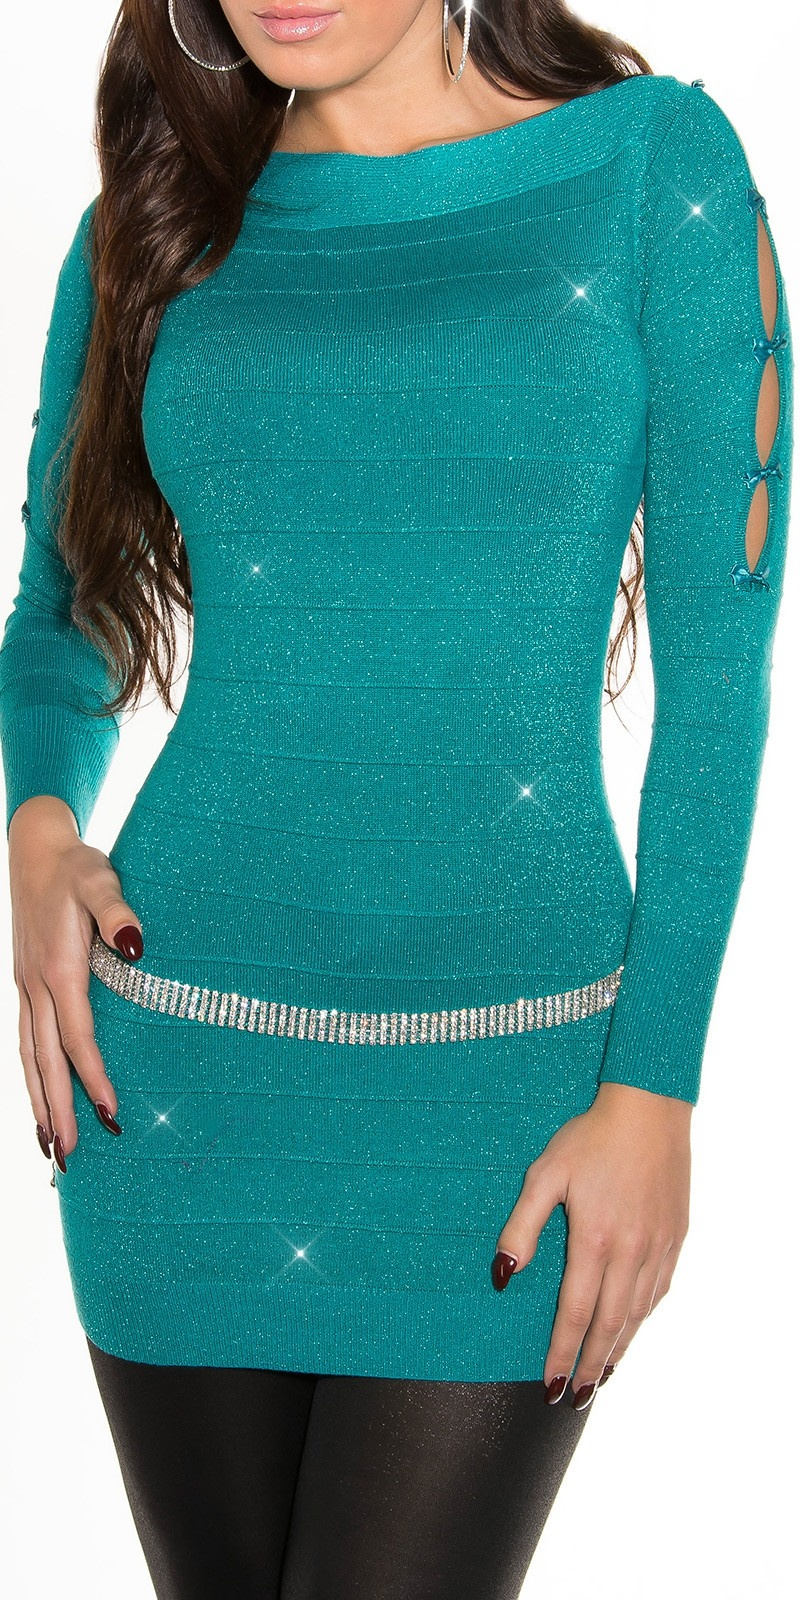 Fineknitted-minidress with glitter-effect Sapphire